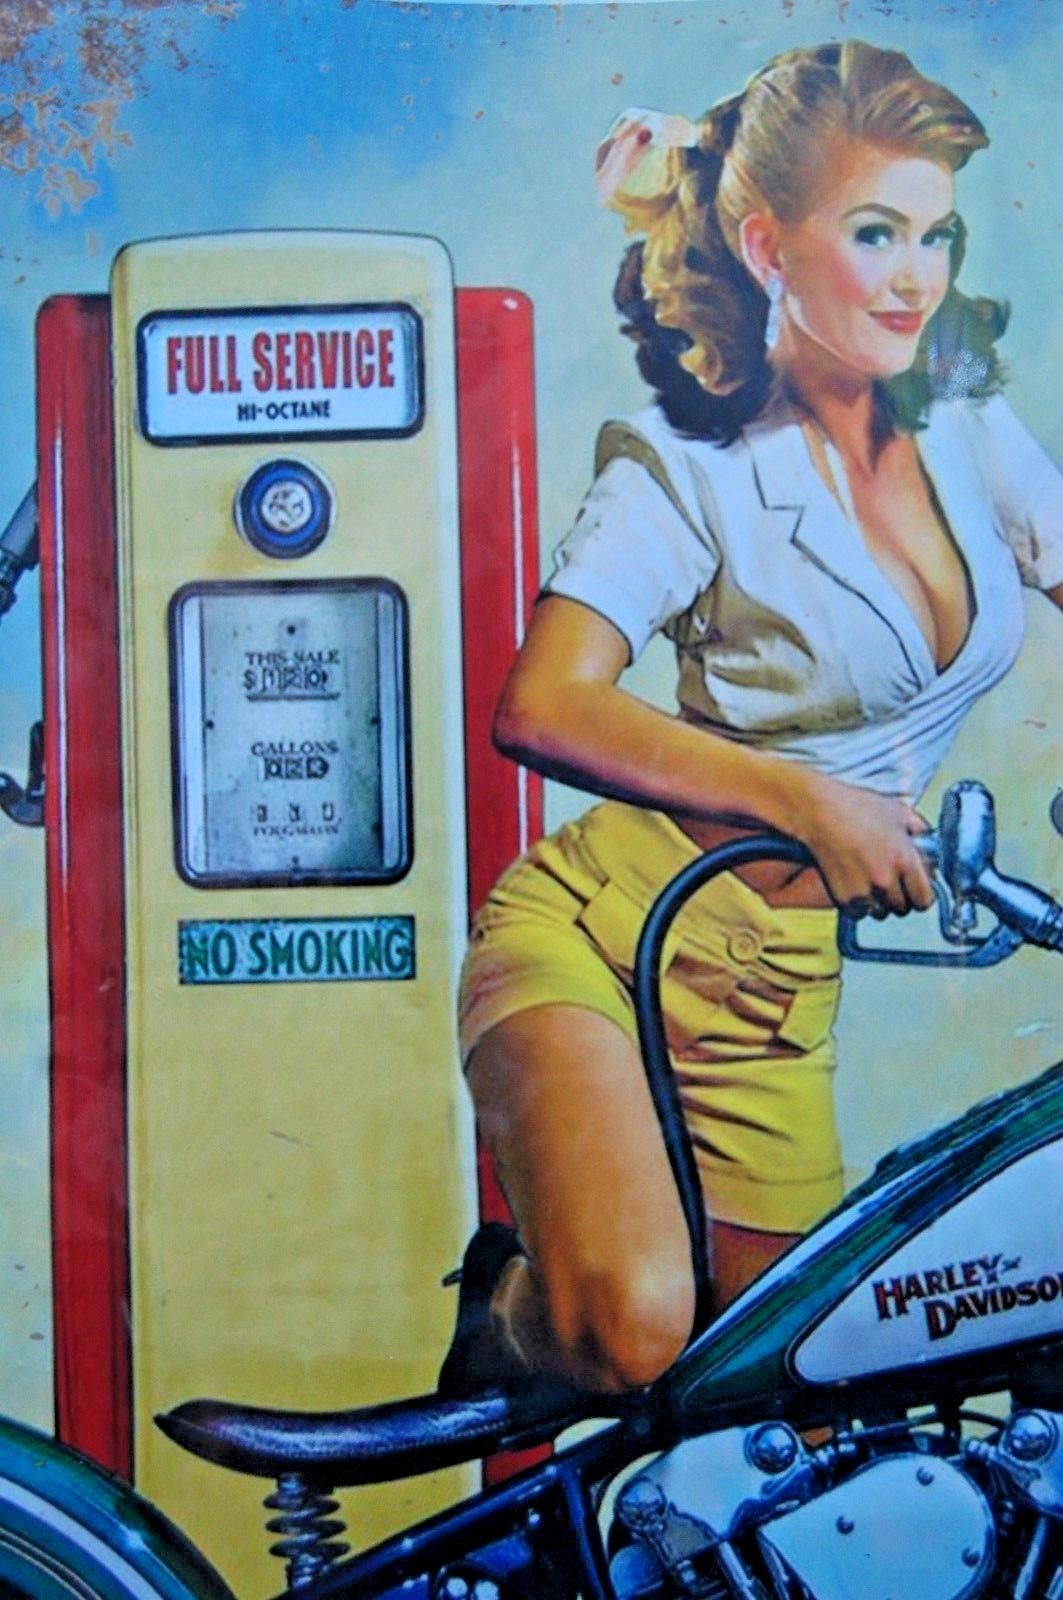 Blech Schild Retro Blechschild Harley-Davidson - Garage Blechschild 25 x 33 cm